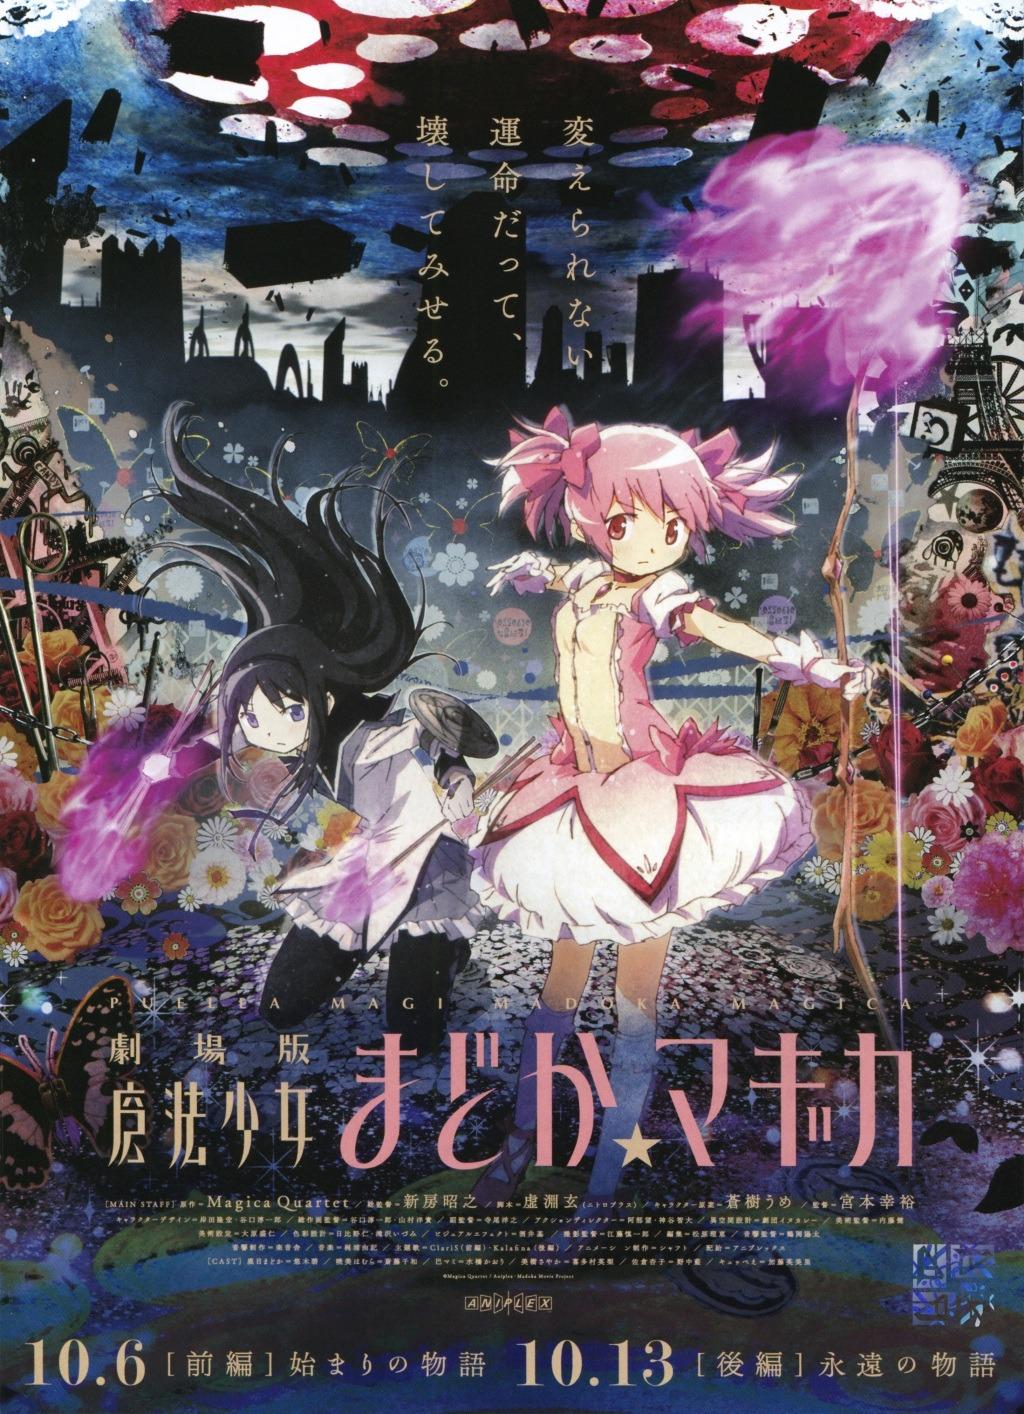 Puella Magi Madoka Magica: The Movie - Eternal poster